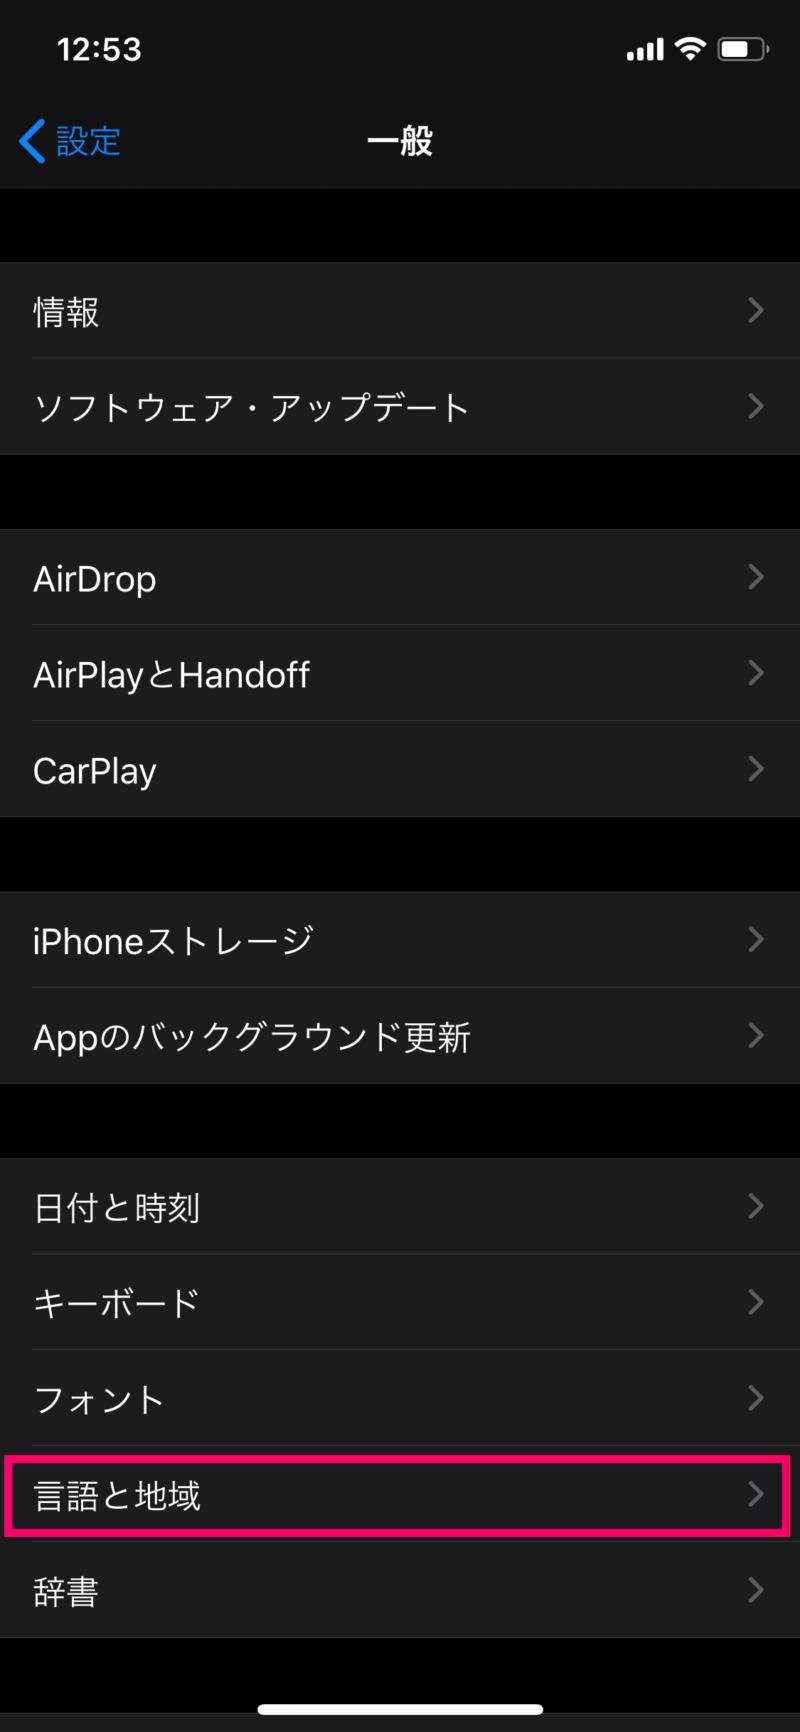 iPhoneの言語設定を英語に変える方法2